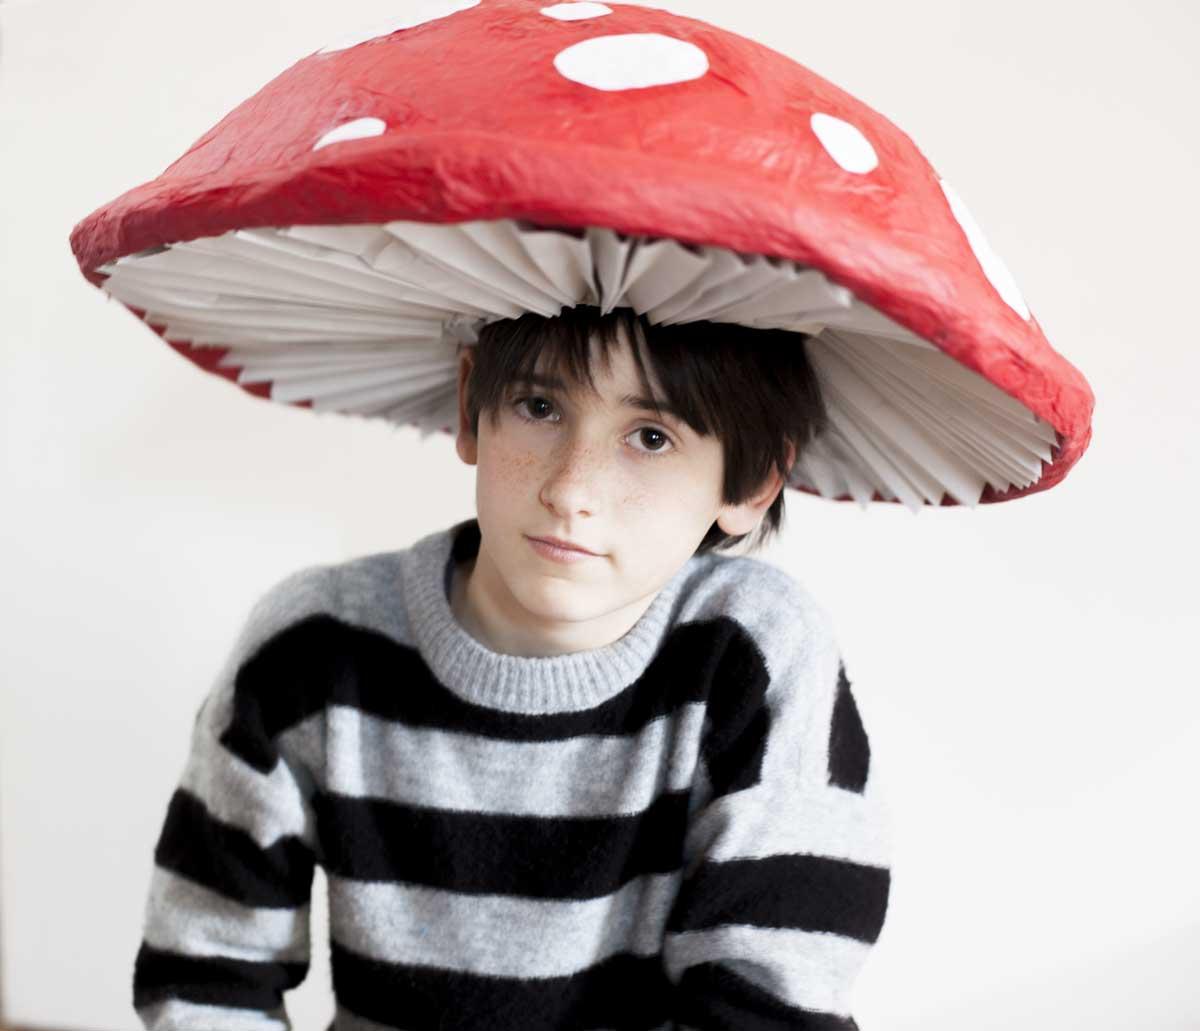 manualidad-pilz-verkleidung-disfraz-seta-mushroom-costume-selfmade-diy